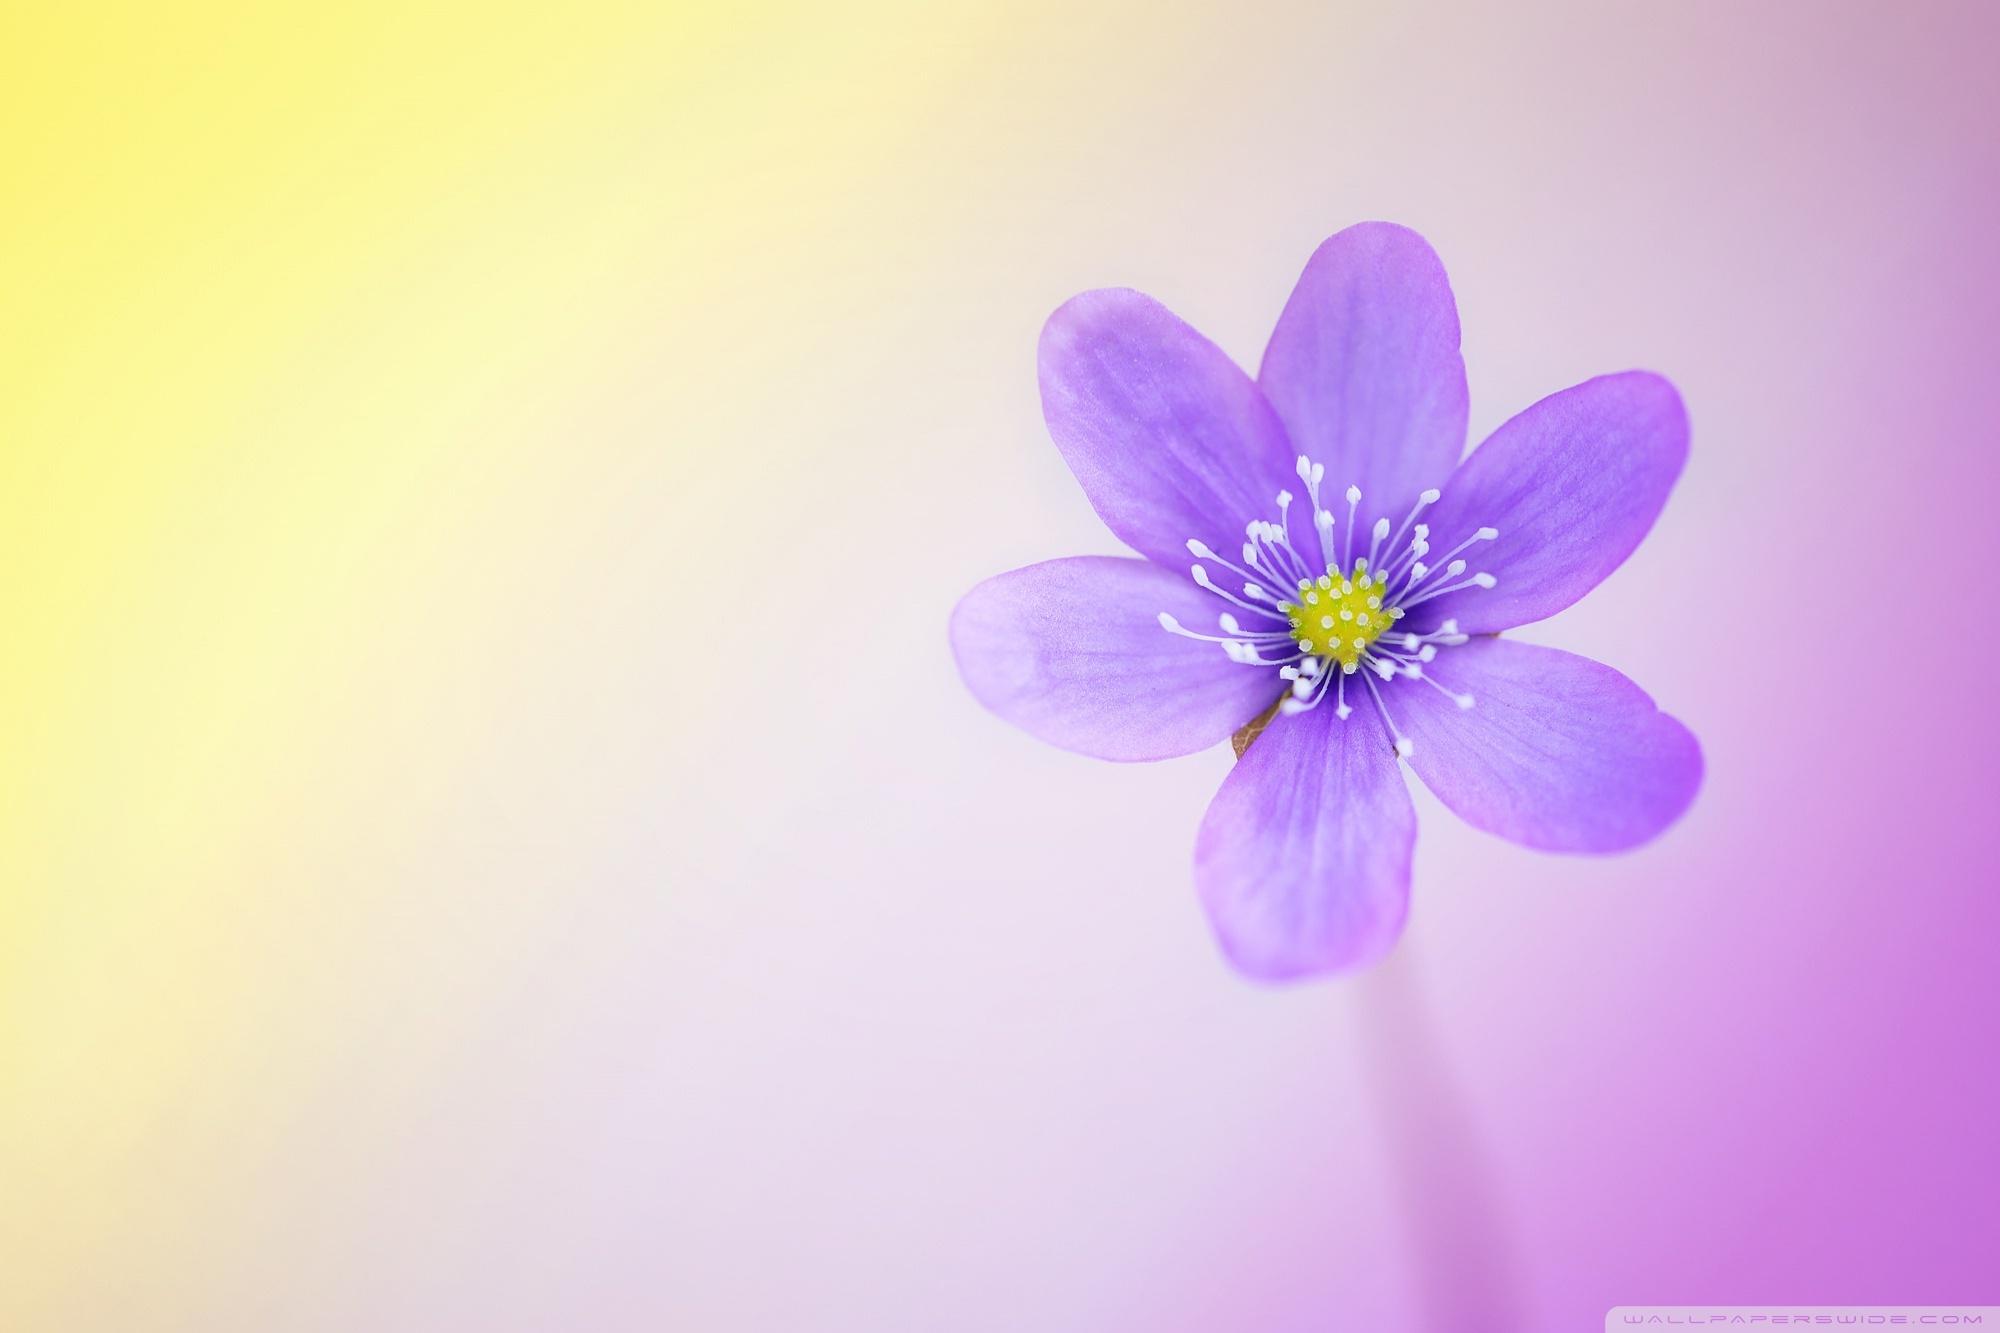 Cute and Colorful ❤ 4K HD Desktop Wallpaper for 4K Ultra HD TV ...